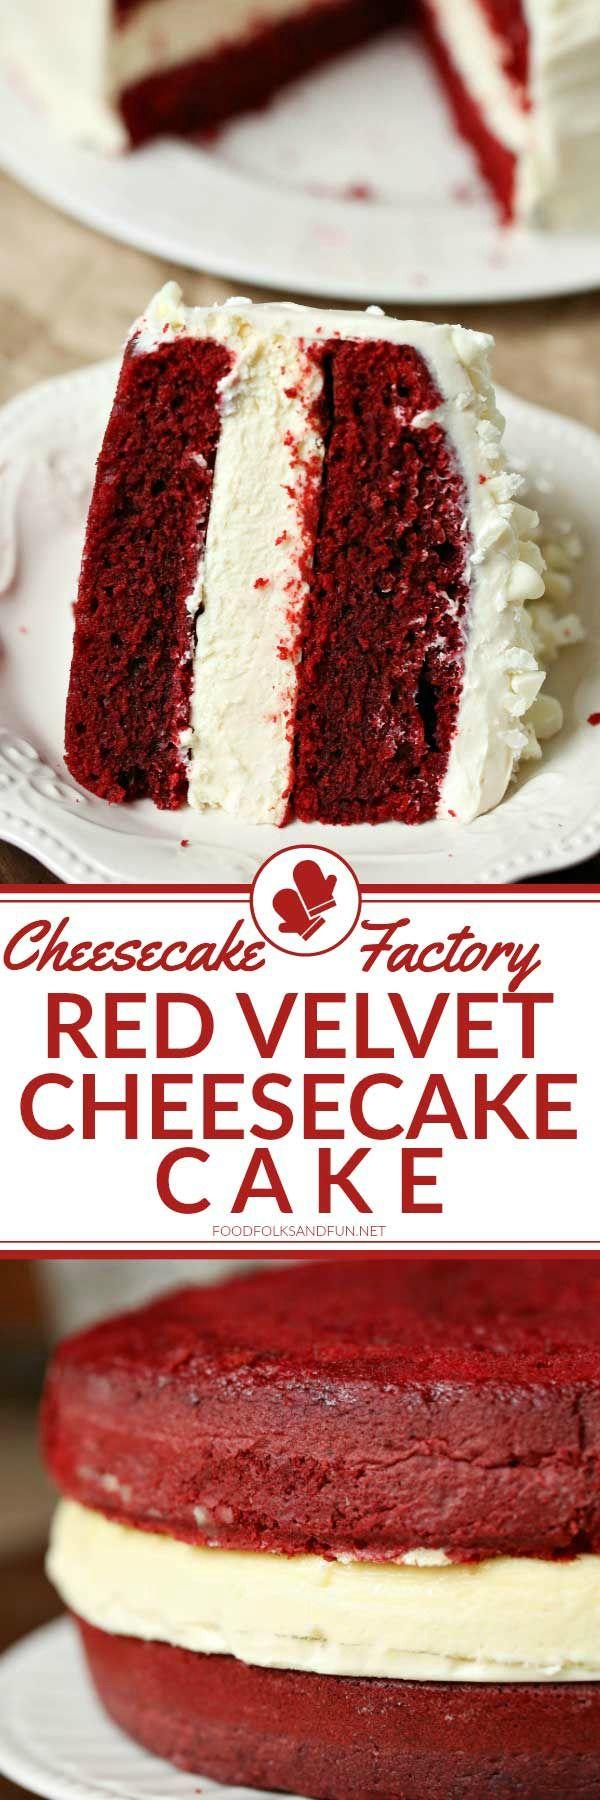 Cheesecake Factory Red Velvet Cheesecake Cake Copycat #redvelvetcheesecake